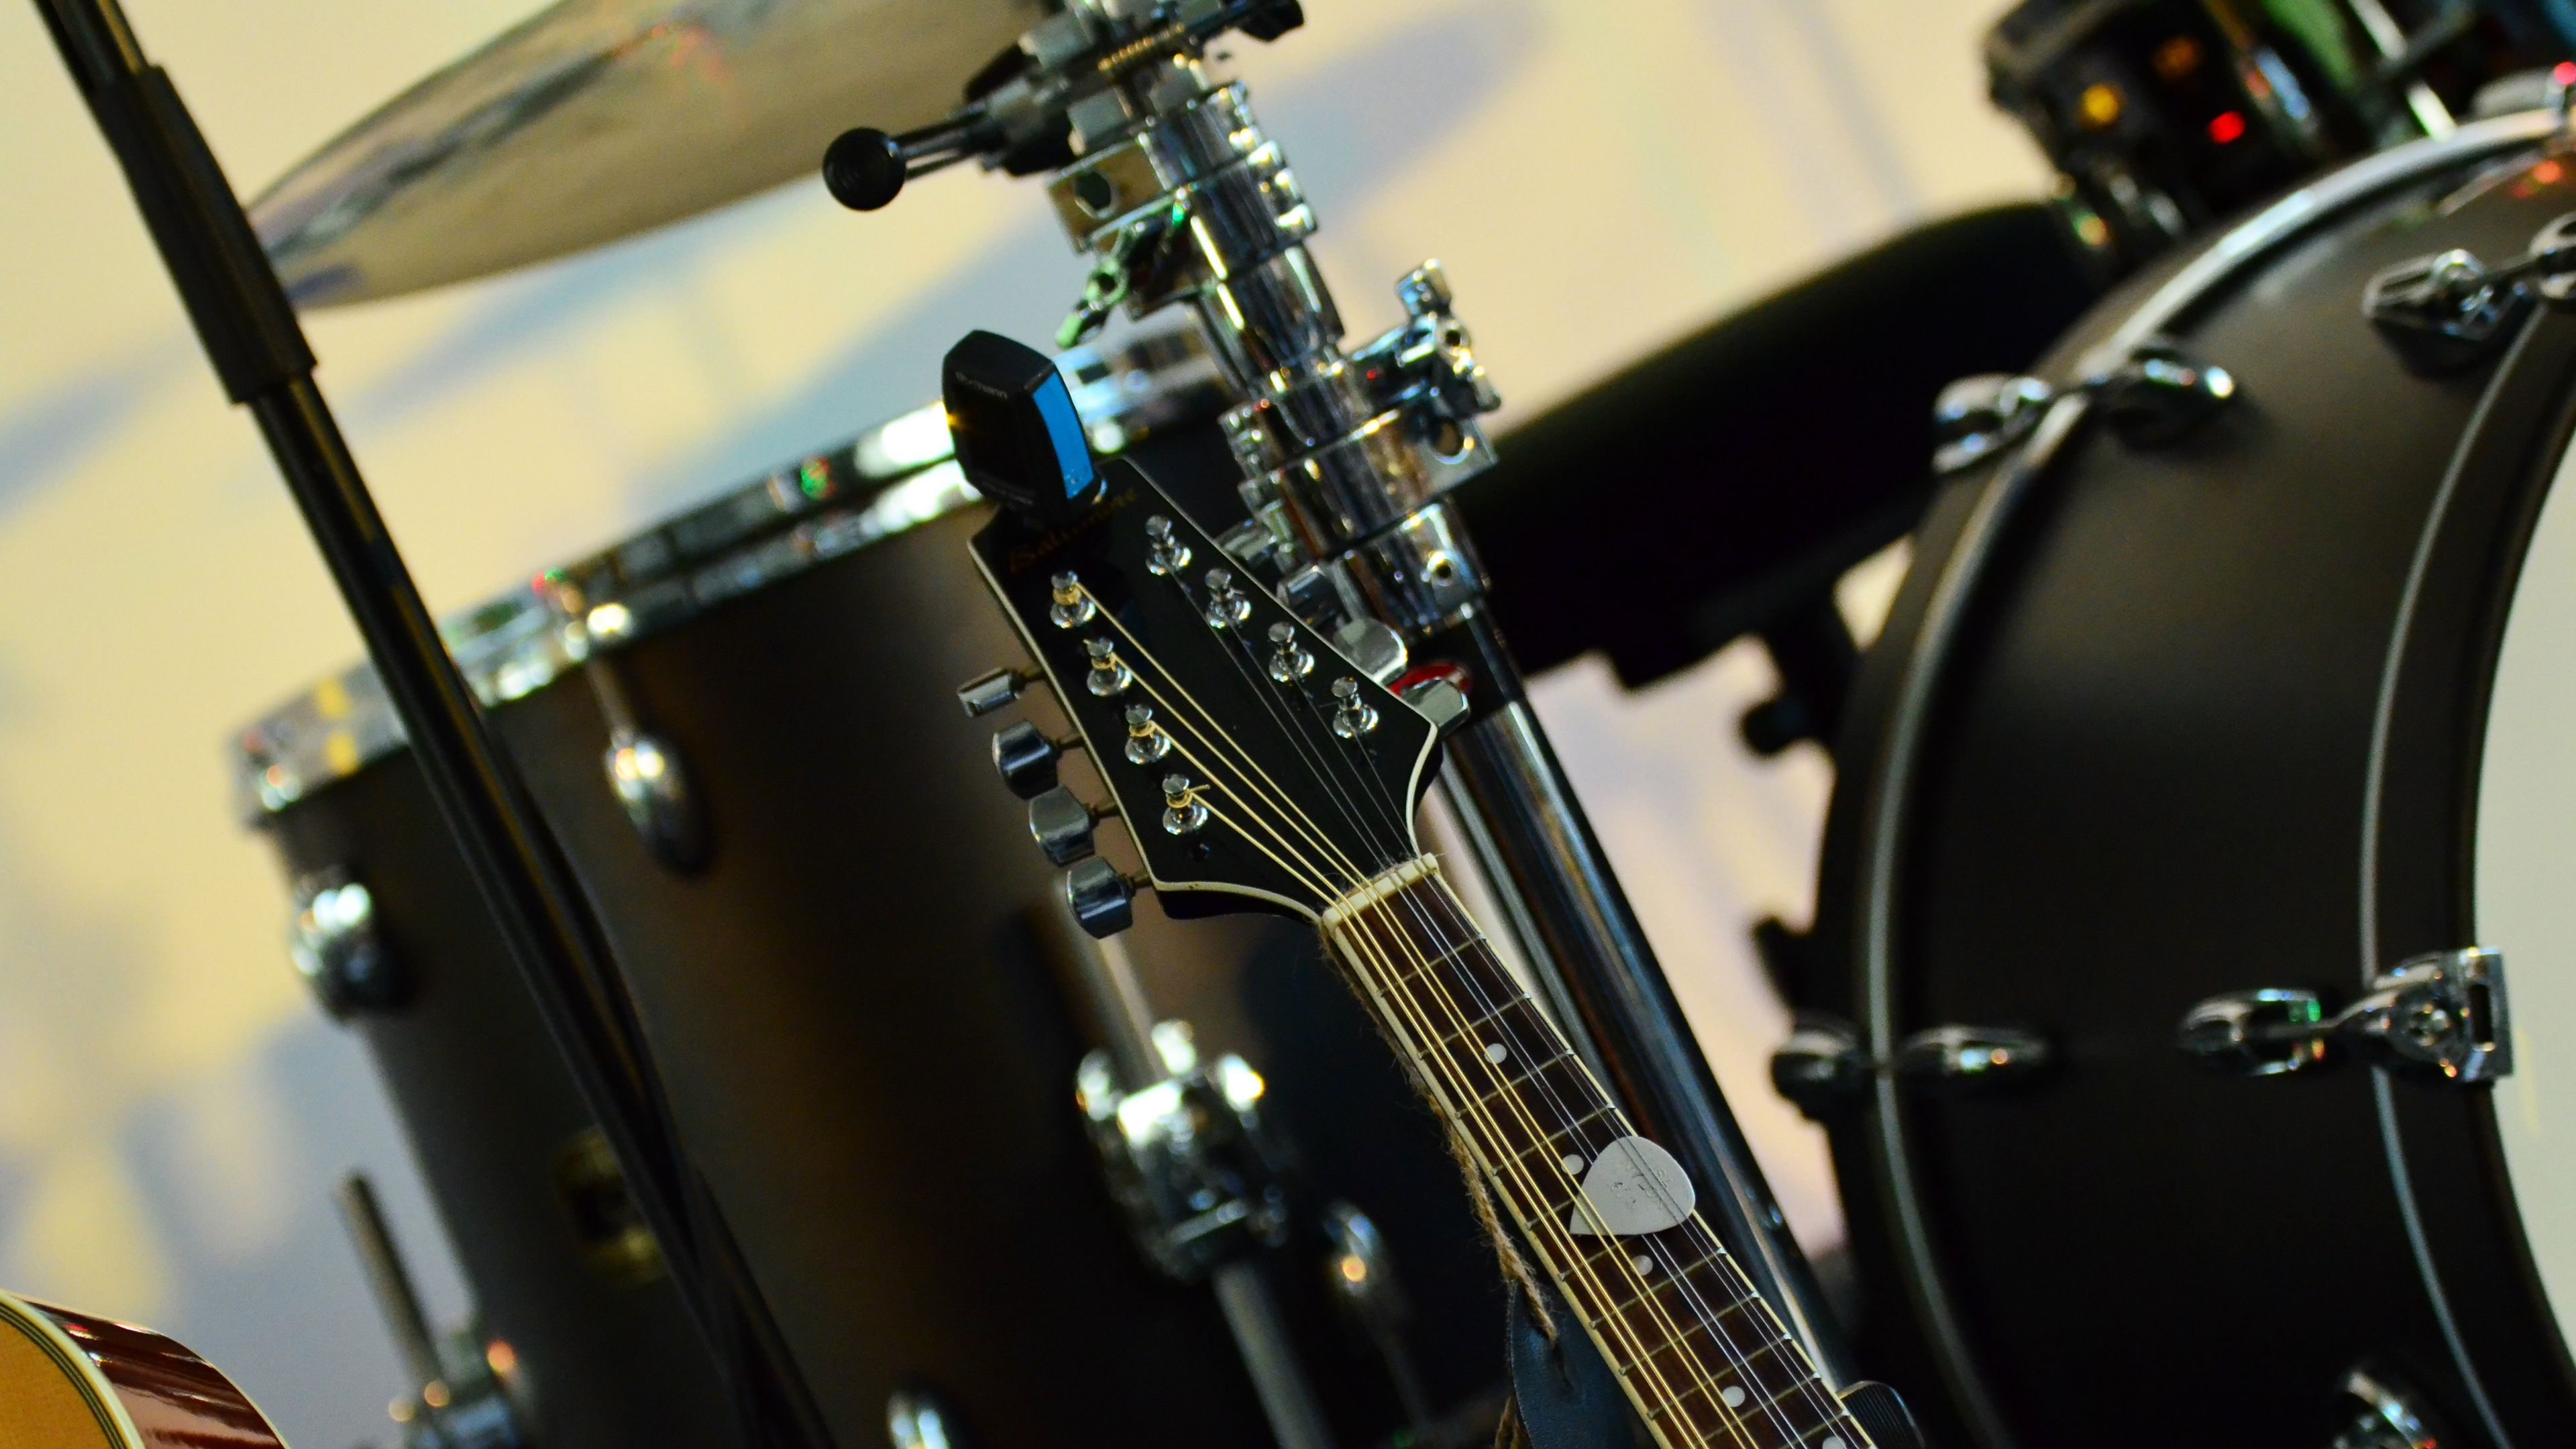 3840x2160 Wallpaper musical instrument, music, percussion, guitar